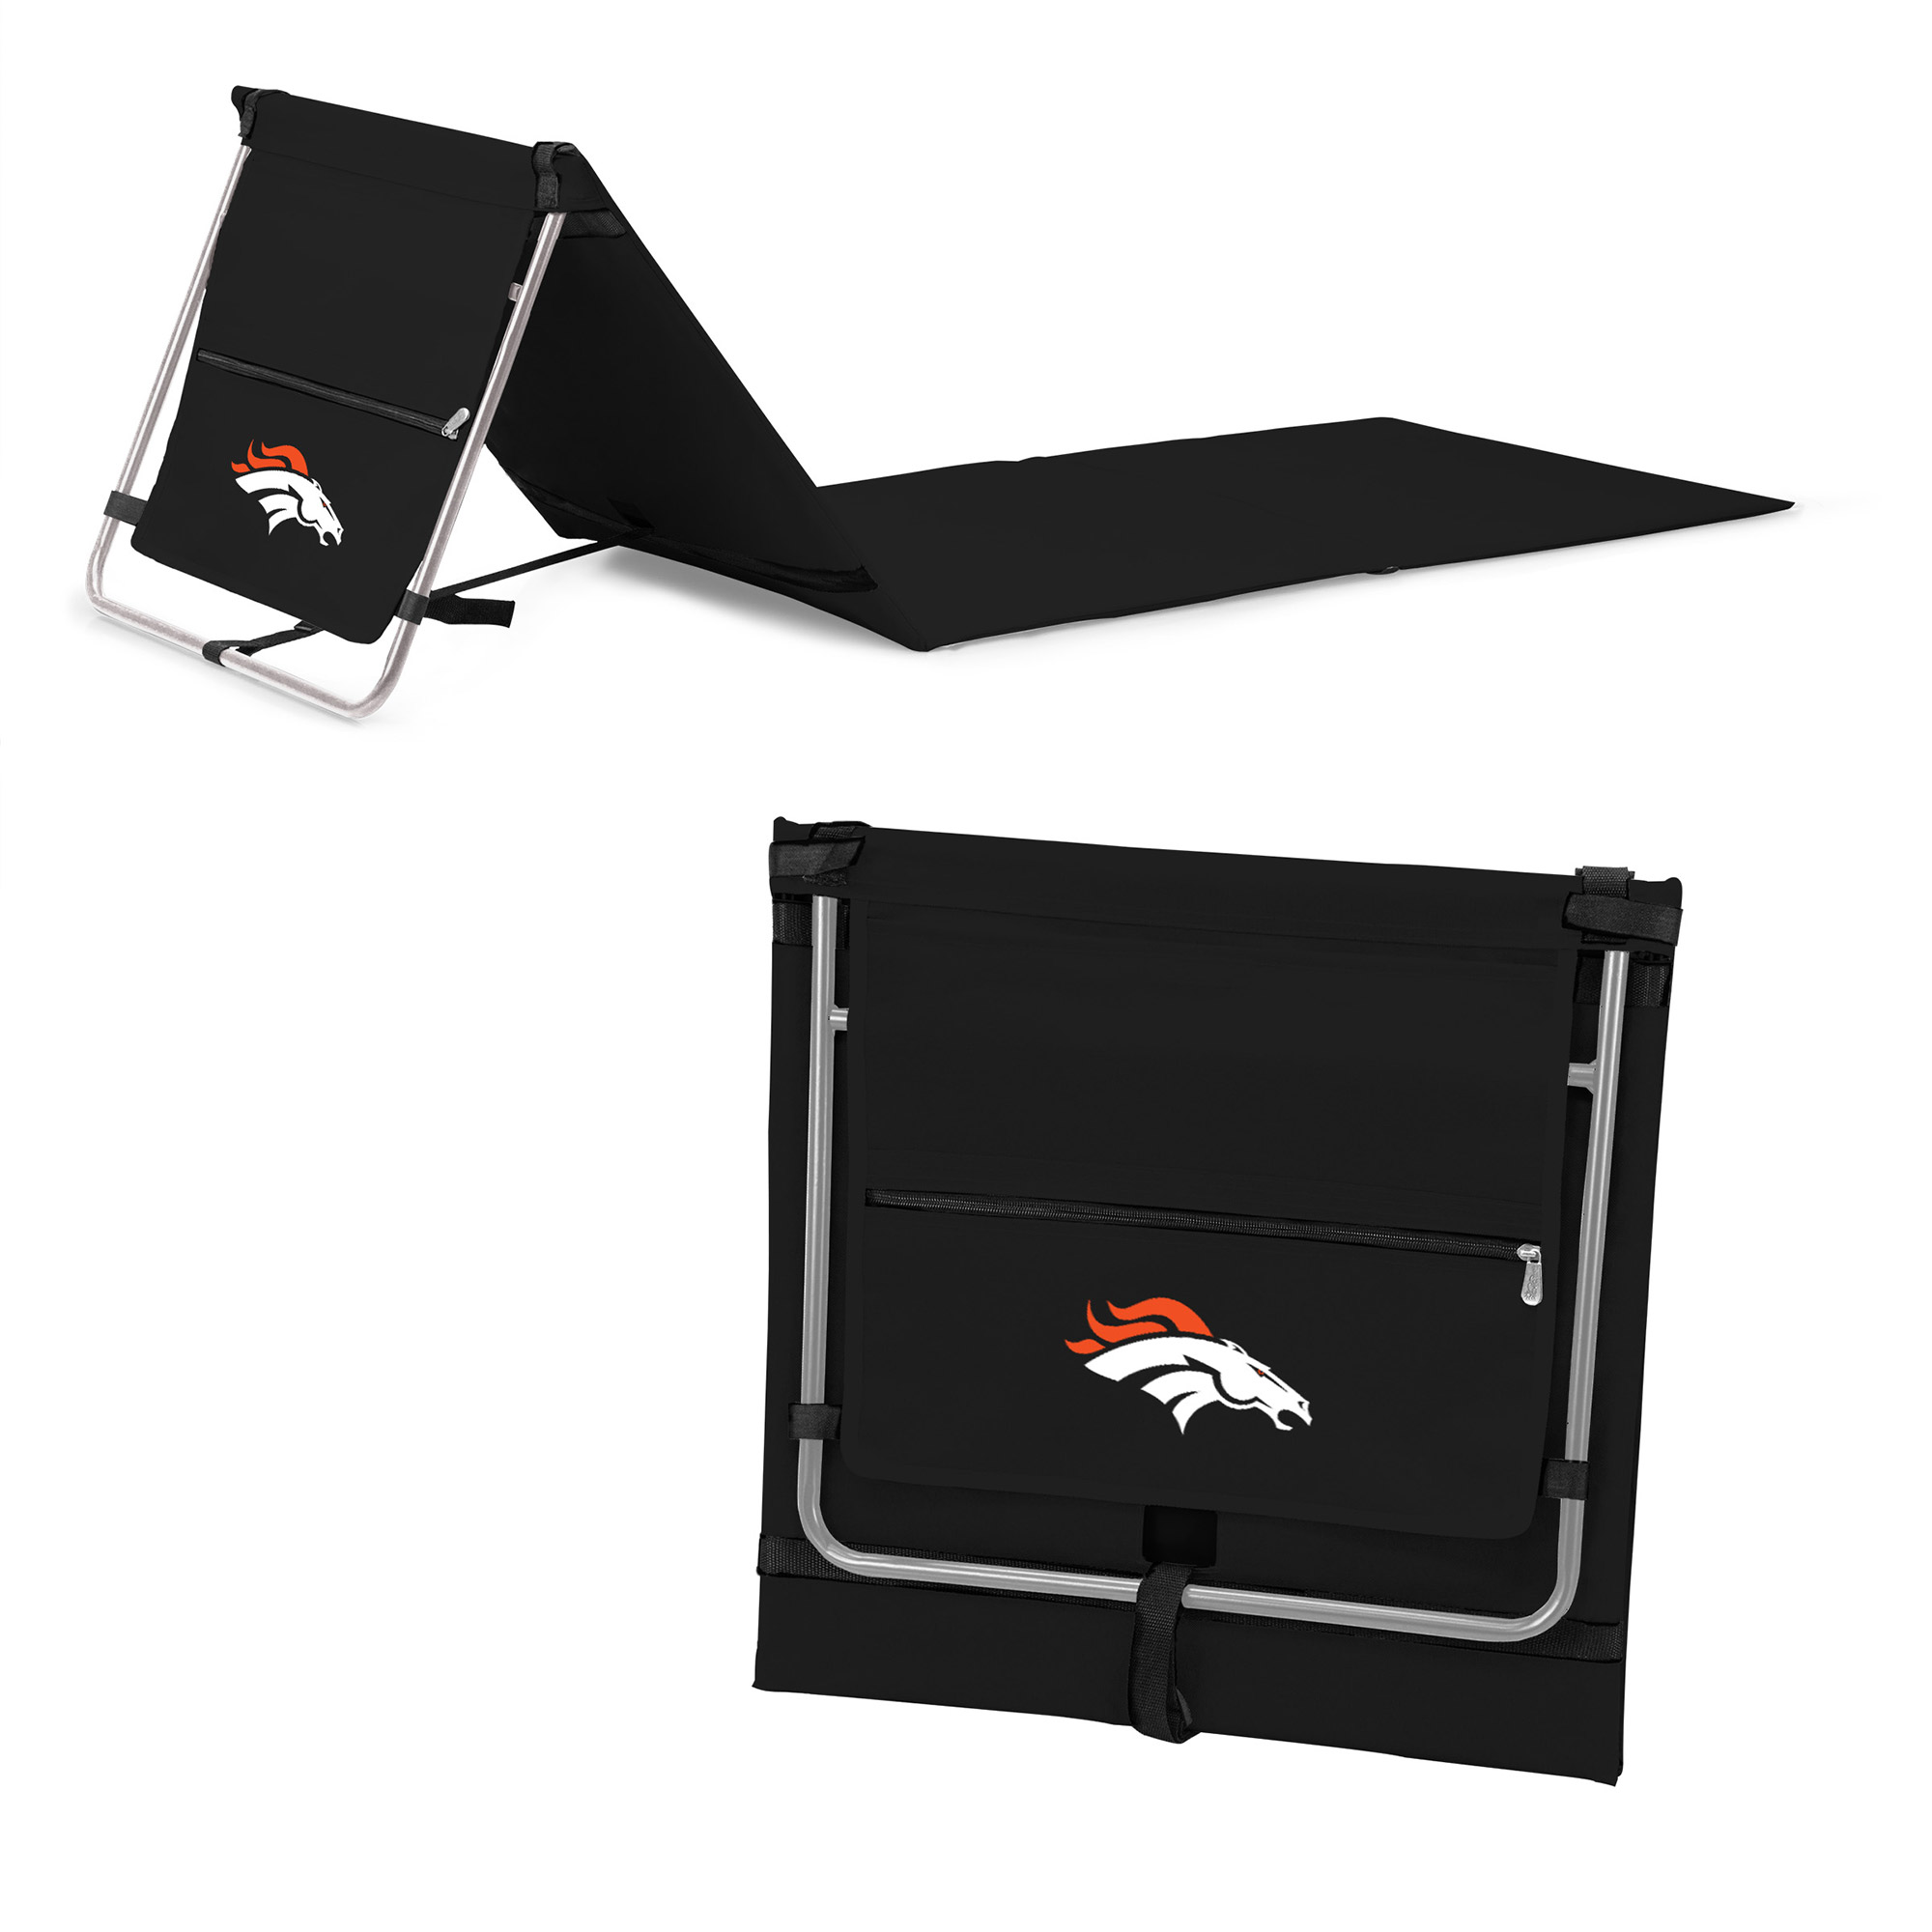 Denver Broncos Portable Lounger Beach Mat - Black - No Size